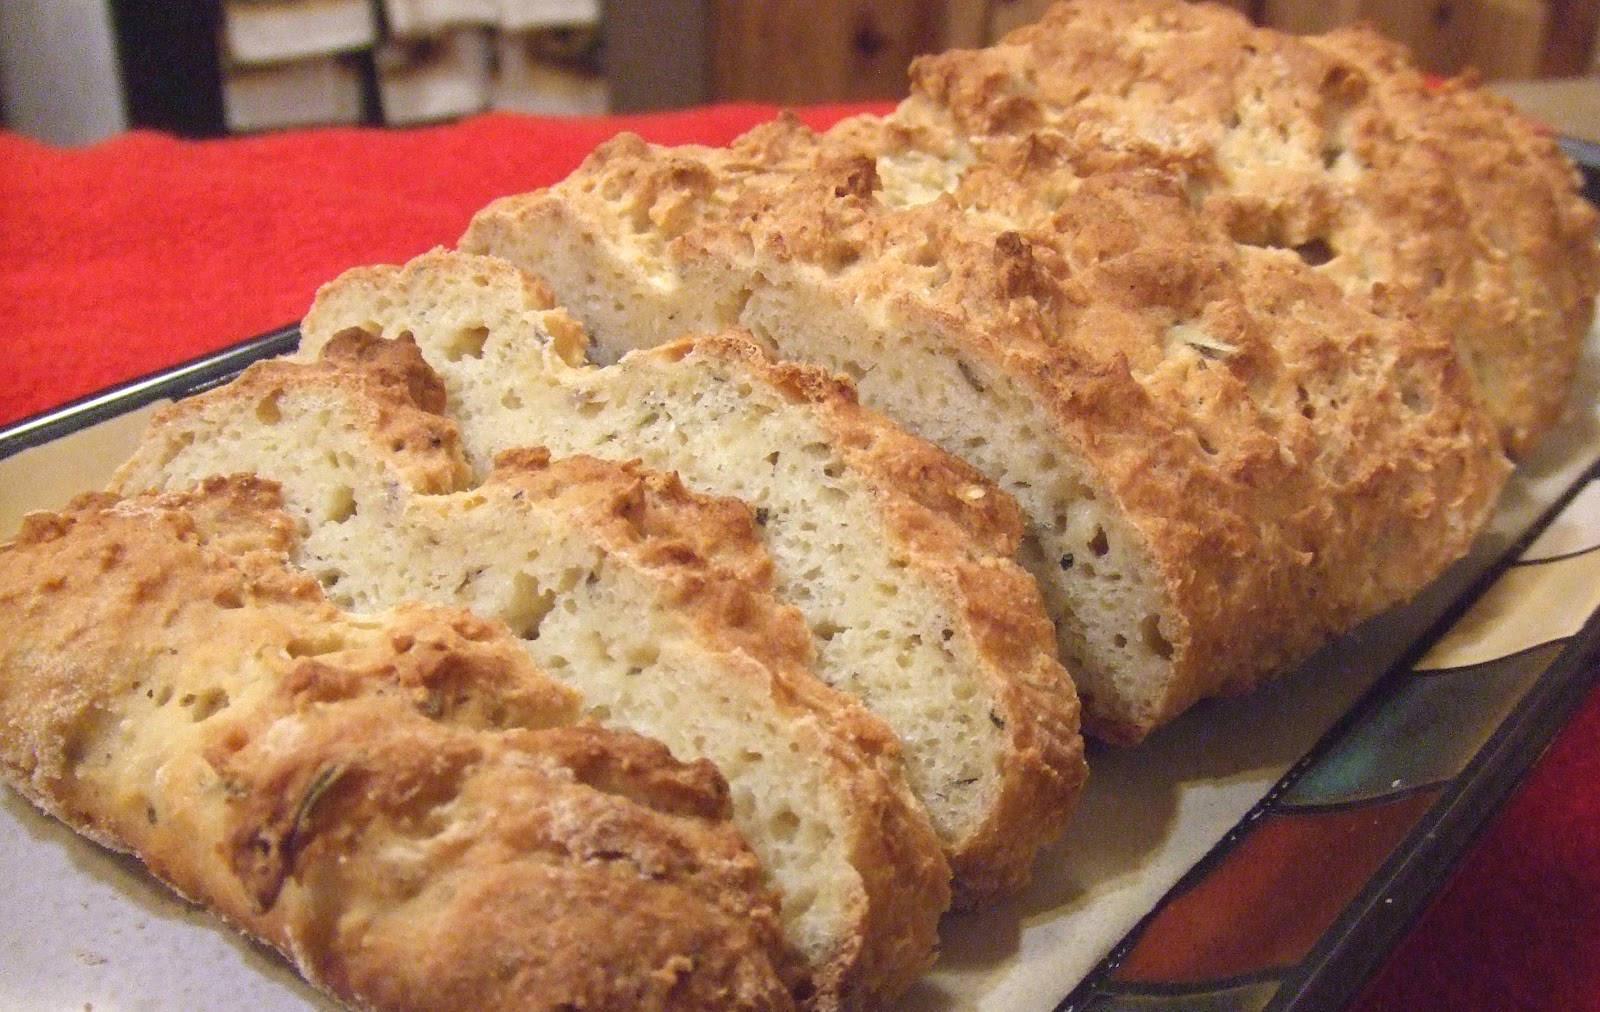 Gluten Free French Bread  Gluten Free French Bread [Vegan] e Green Planet